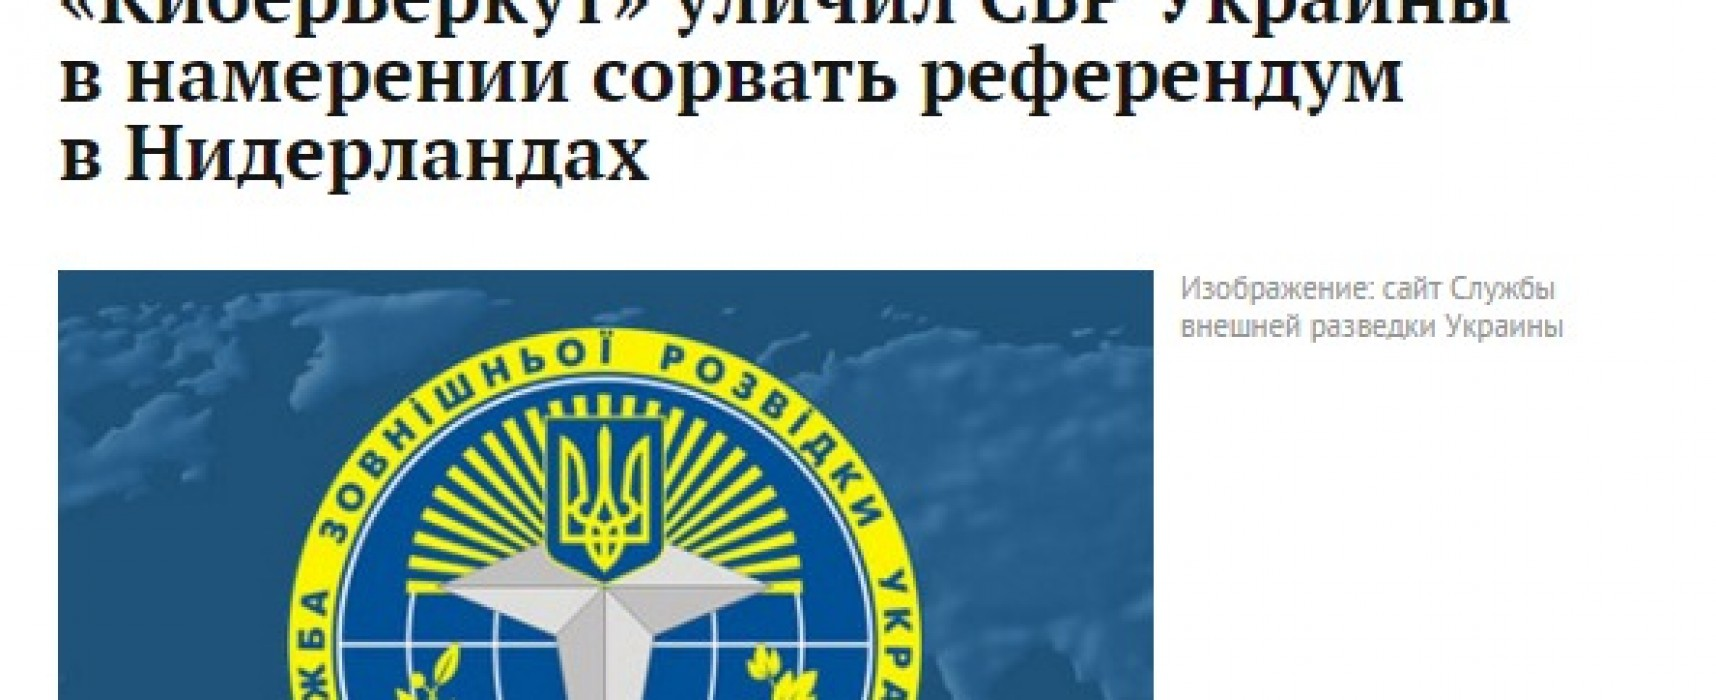 Fake document: Oekraïne wil het Nederlandse referendum dwarsbomen